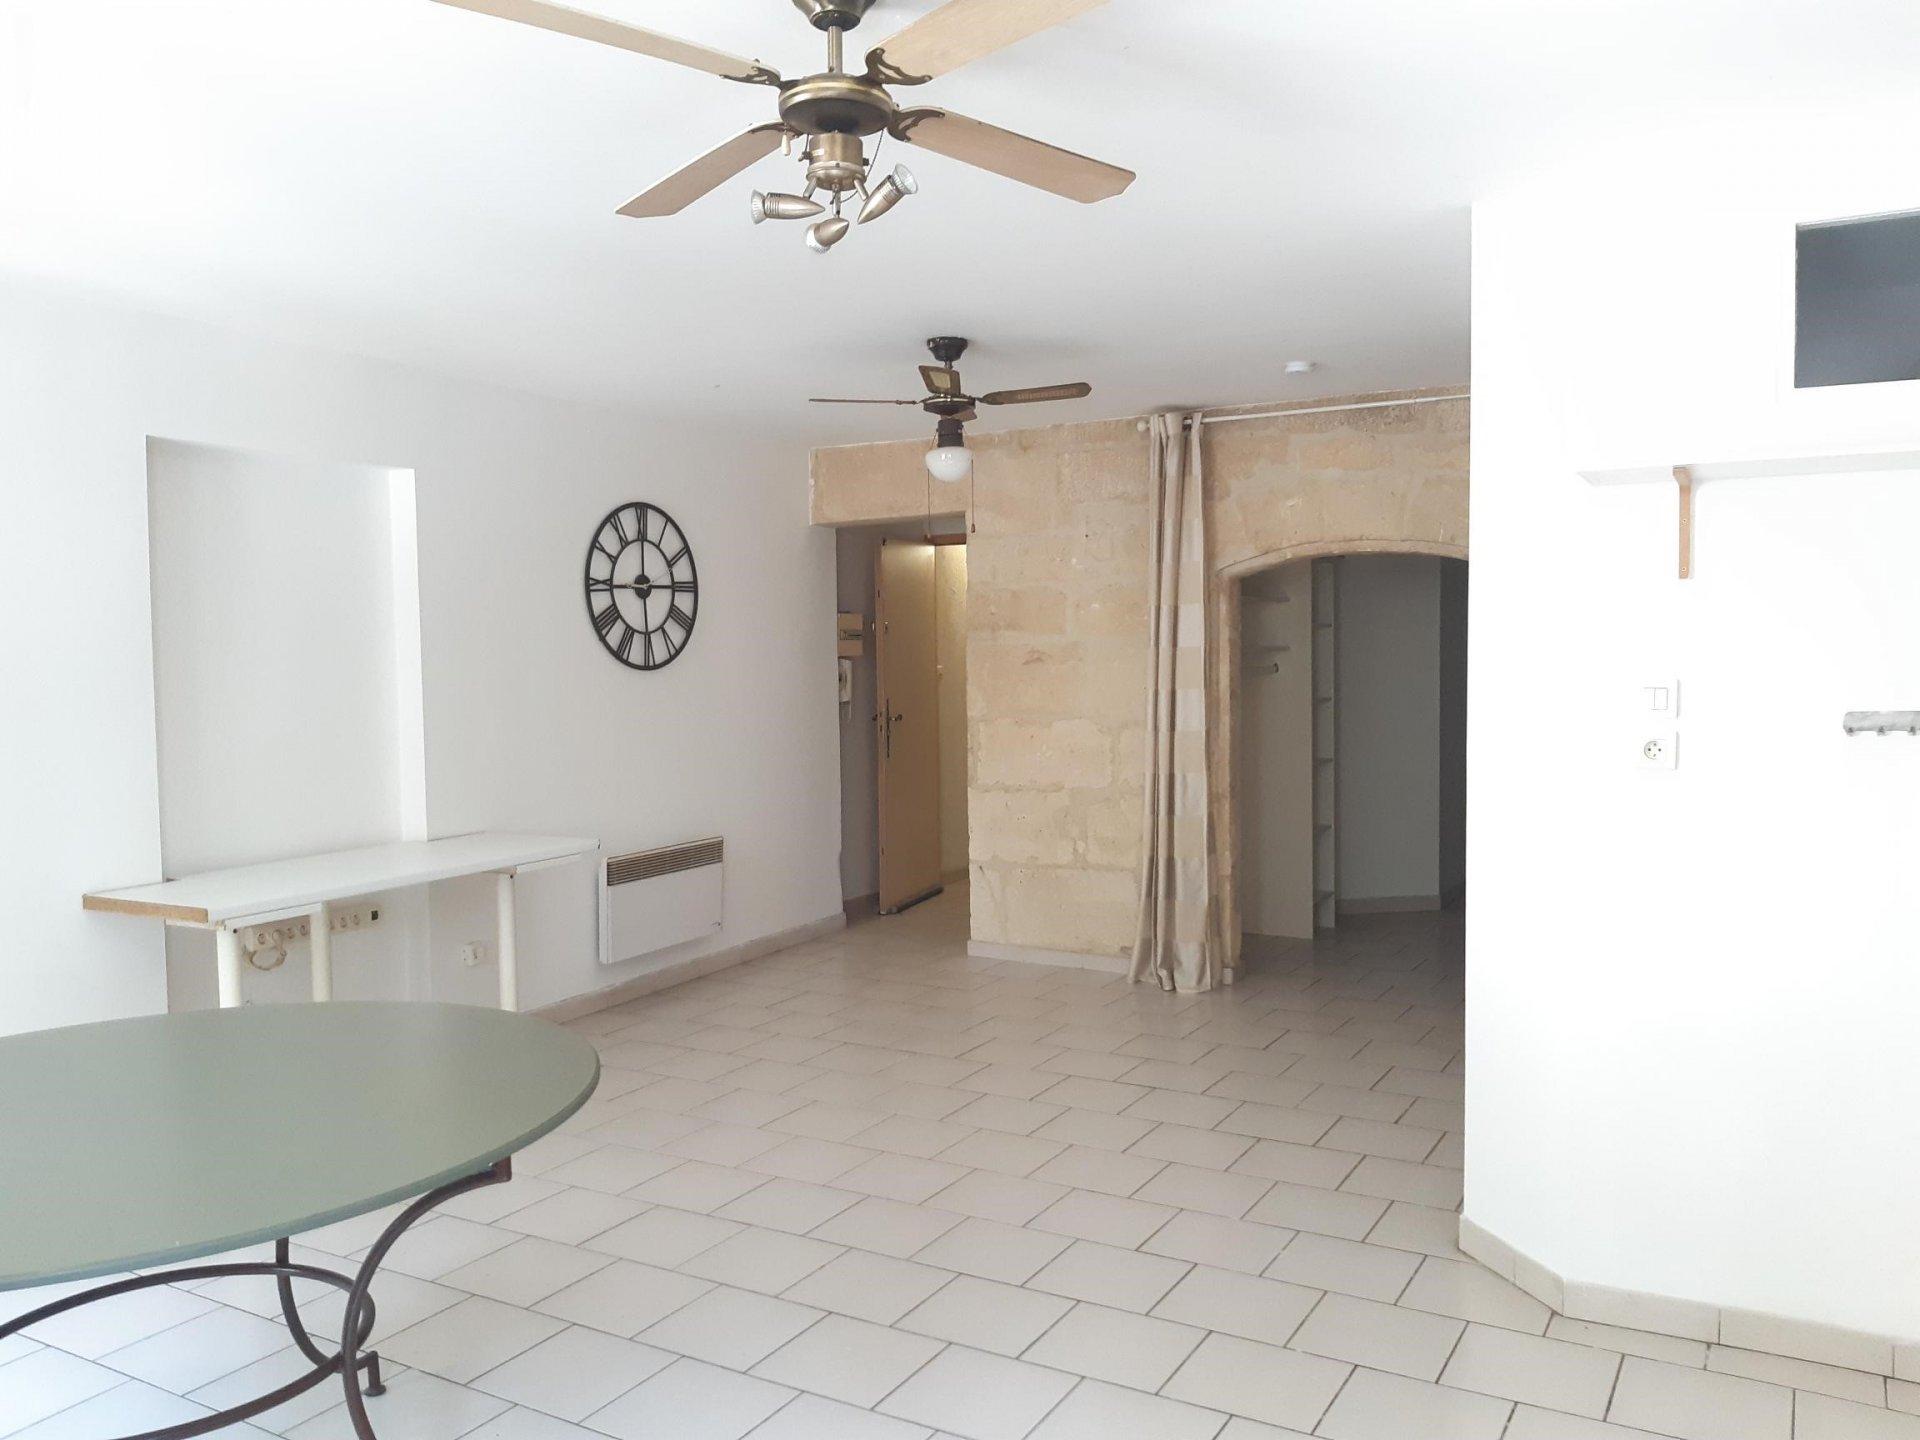 Location Appartement TARASCON surface habitable de 45 m²